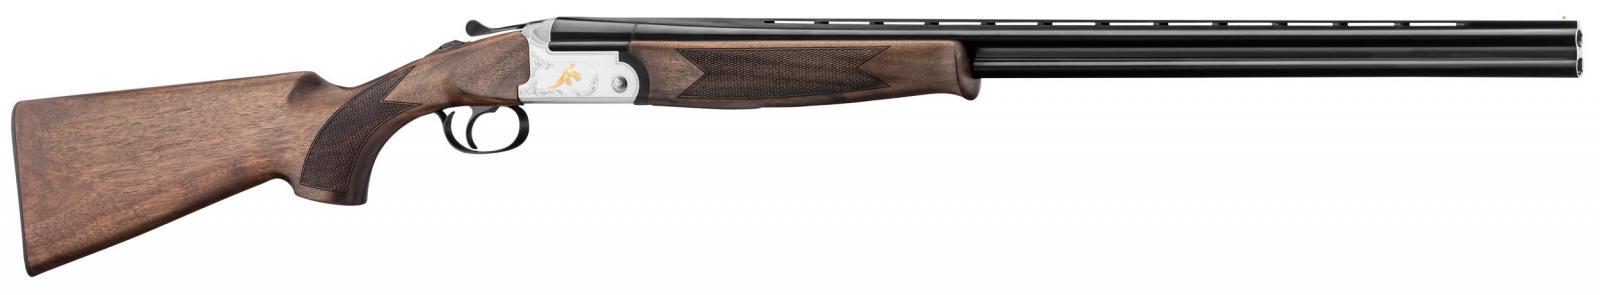 Fusil superposé FAIR Premier Ergal Cal. 410